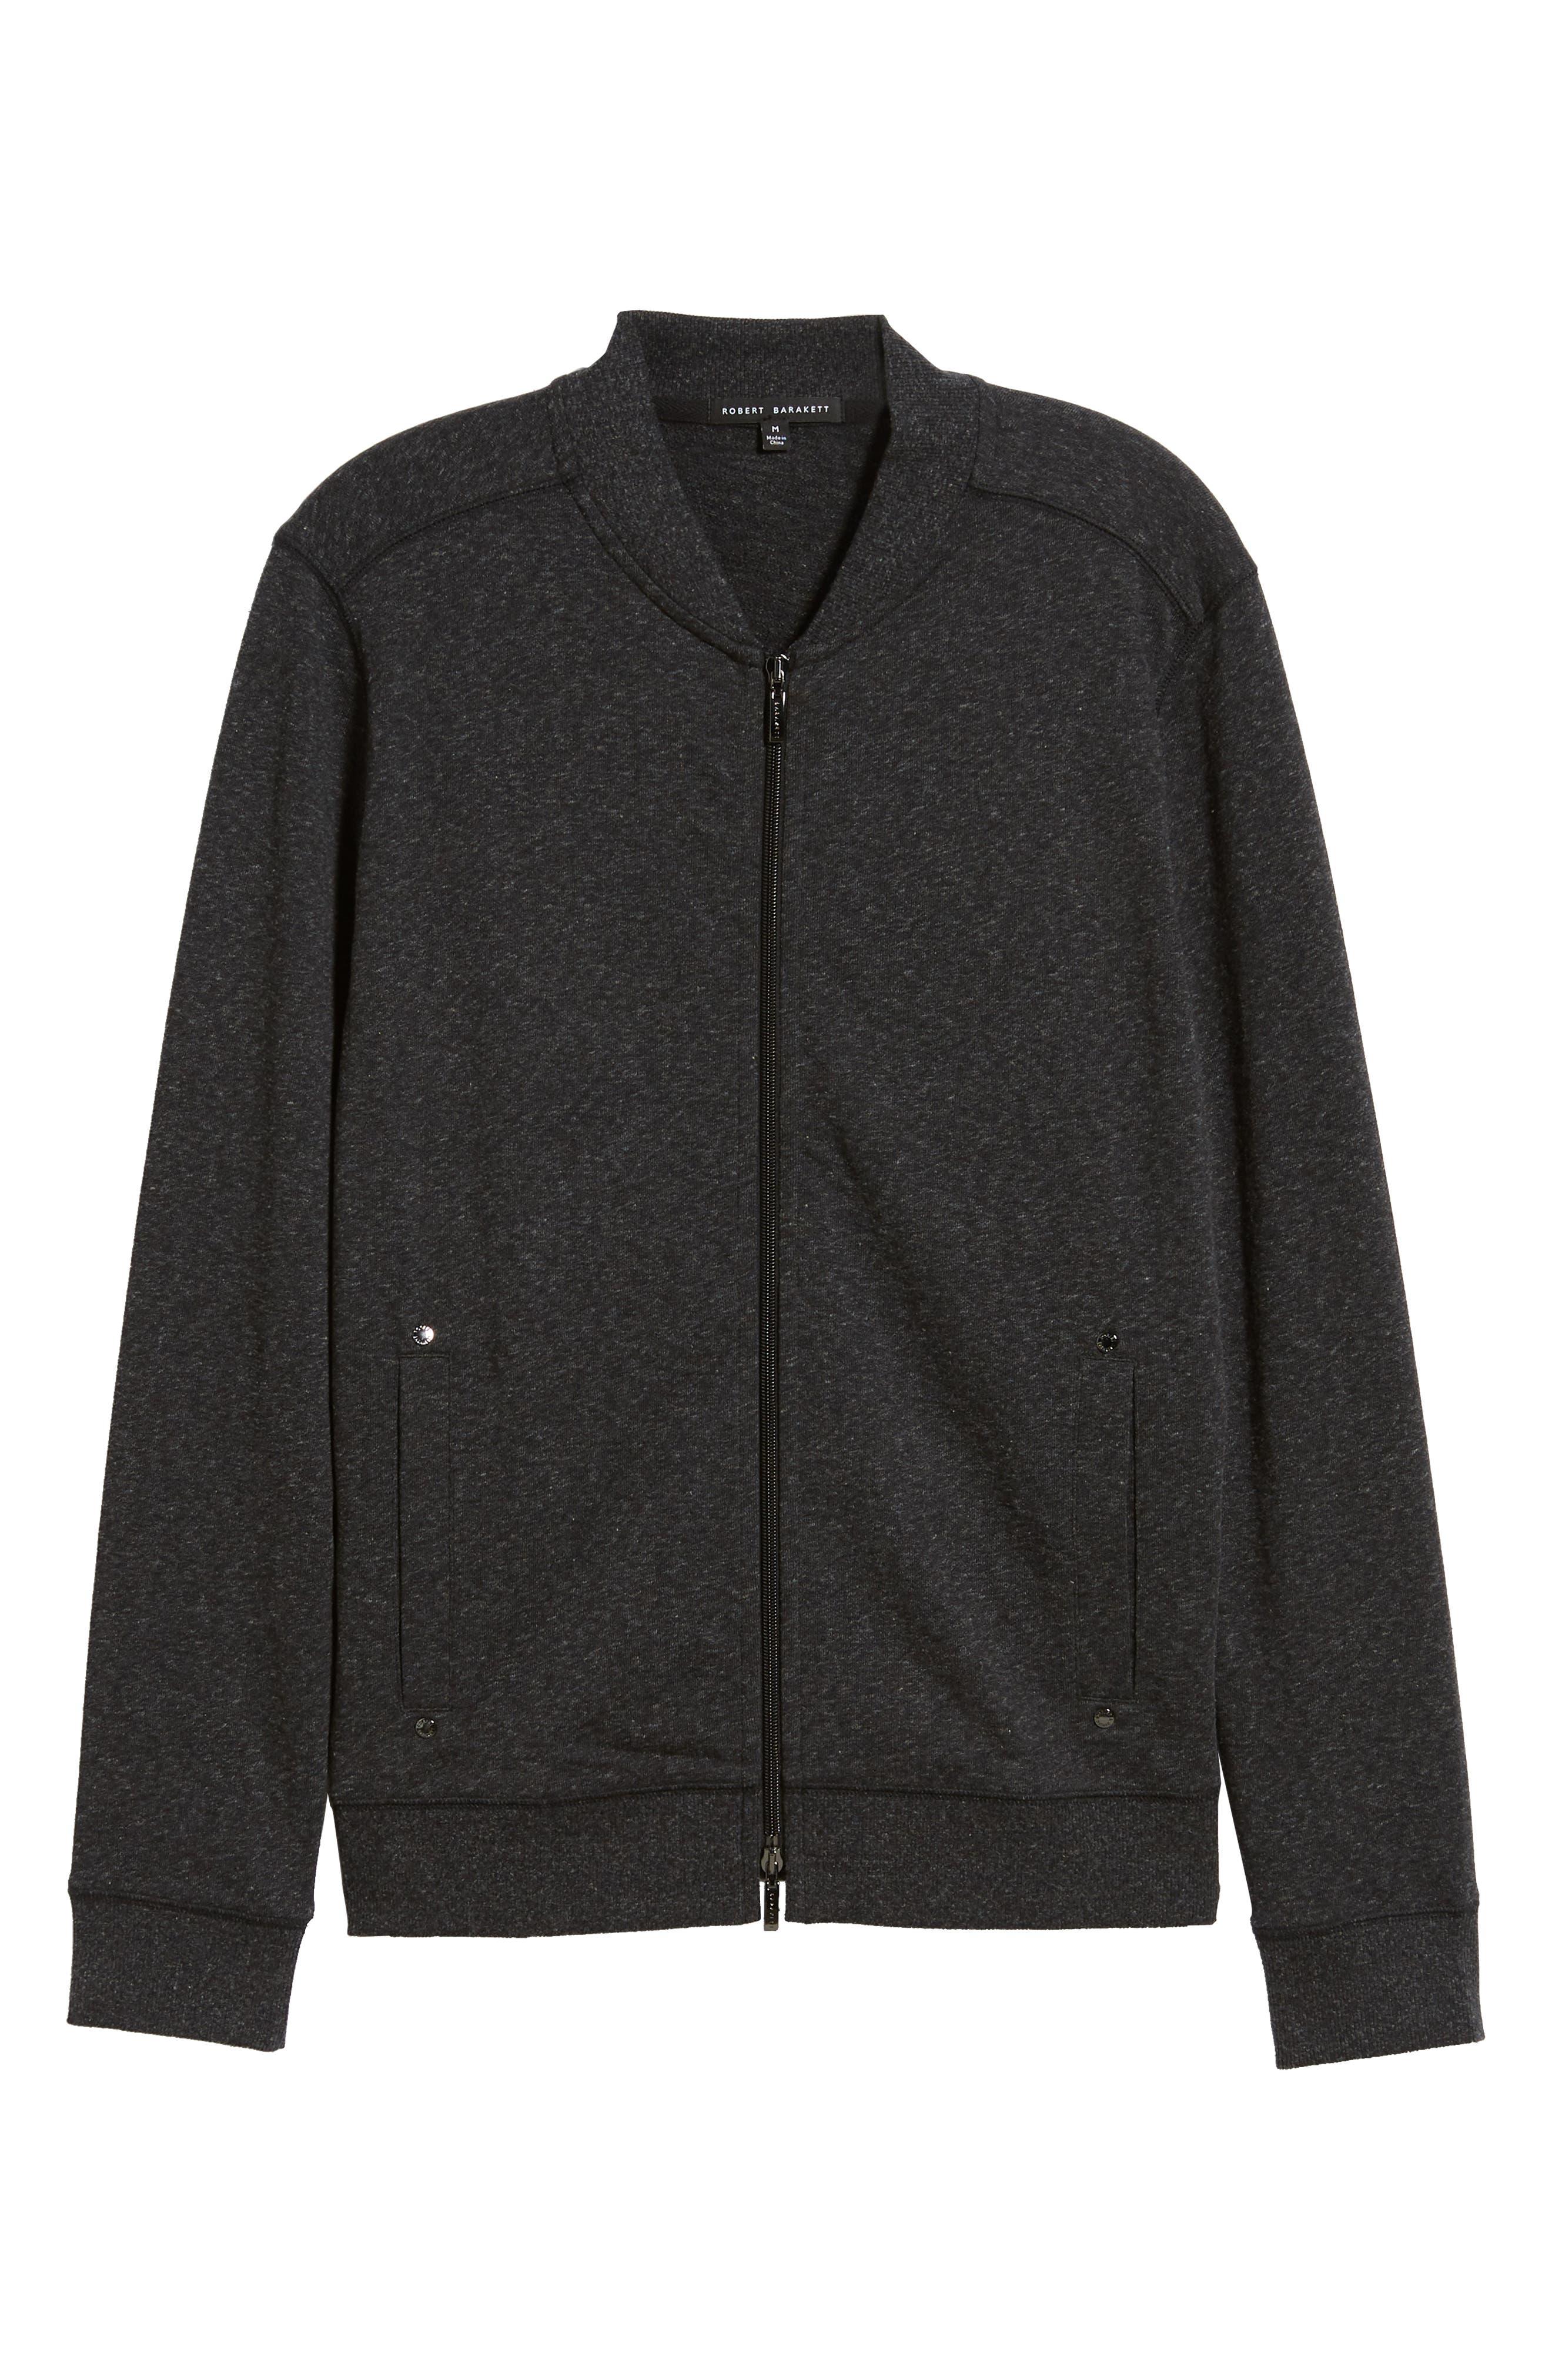 ROBERT BARAKETT, Front Zip Knit Jacket, Alternate thumbnail 6, color, BLACK